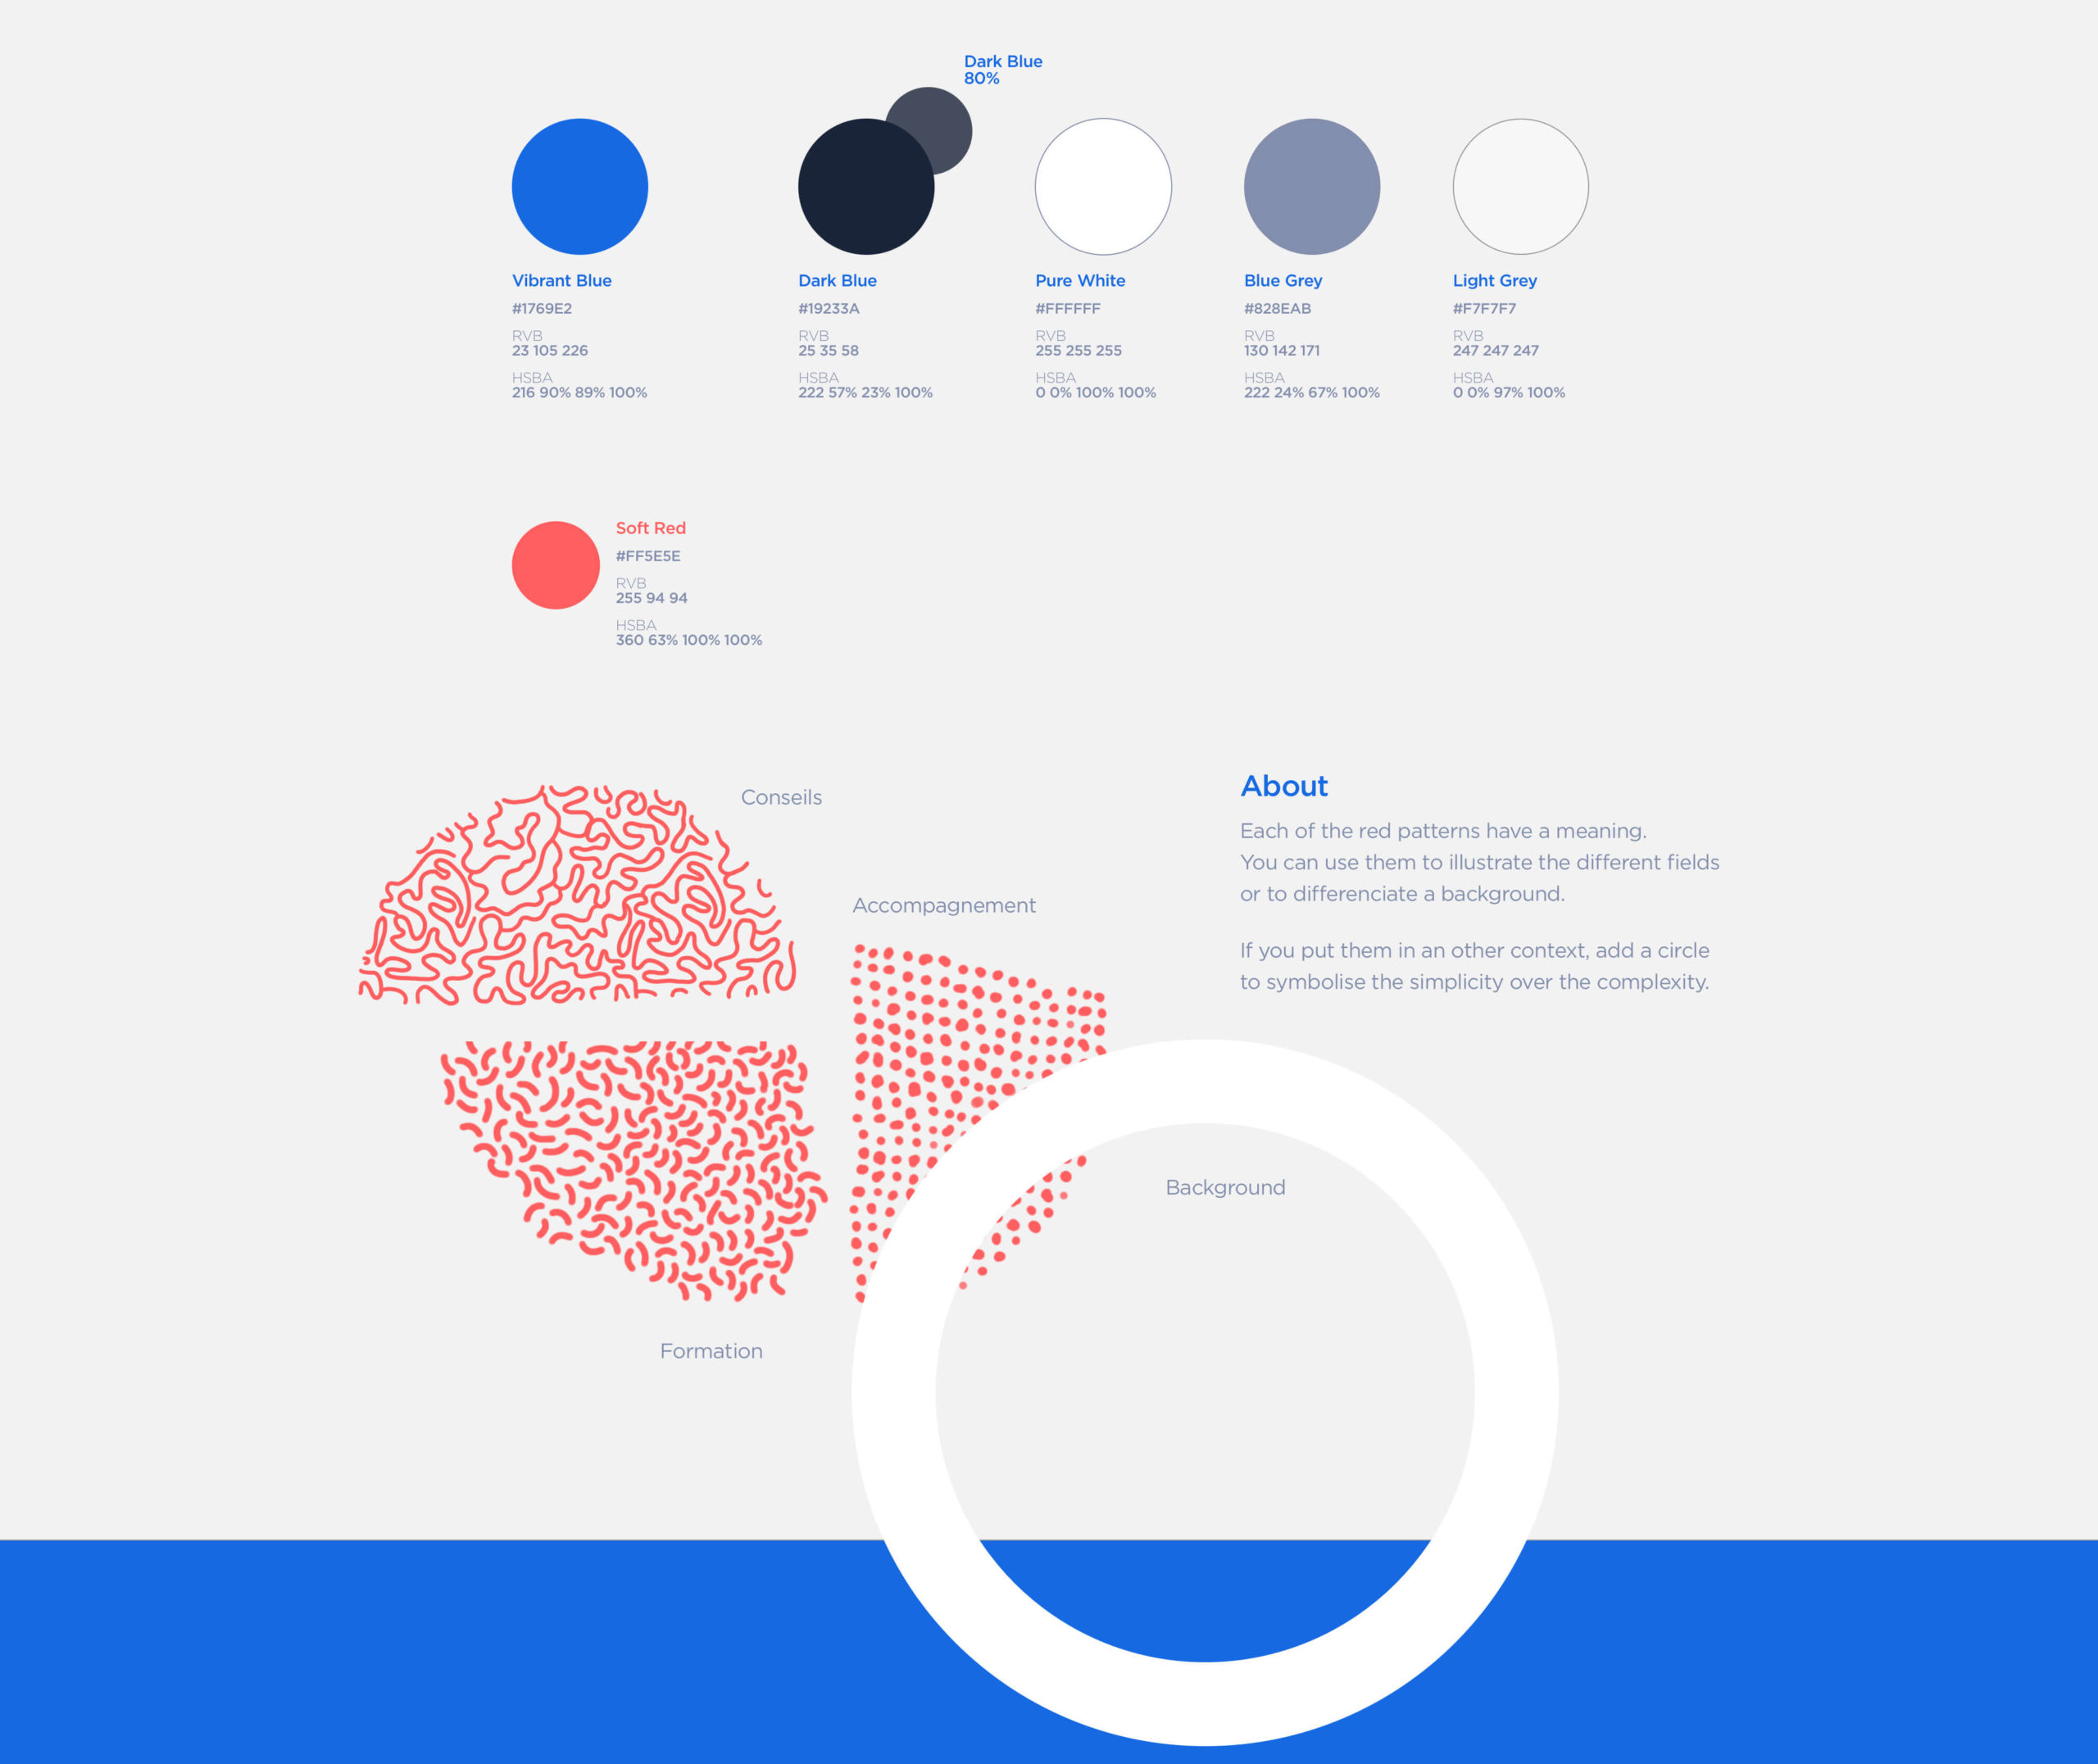 tassart-associes-branding-ux-io-site-illustration-05